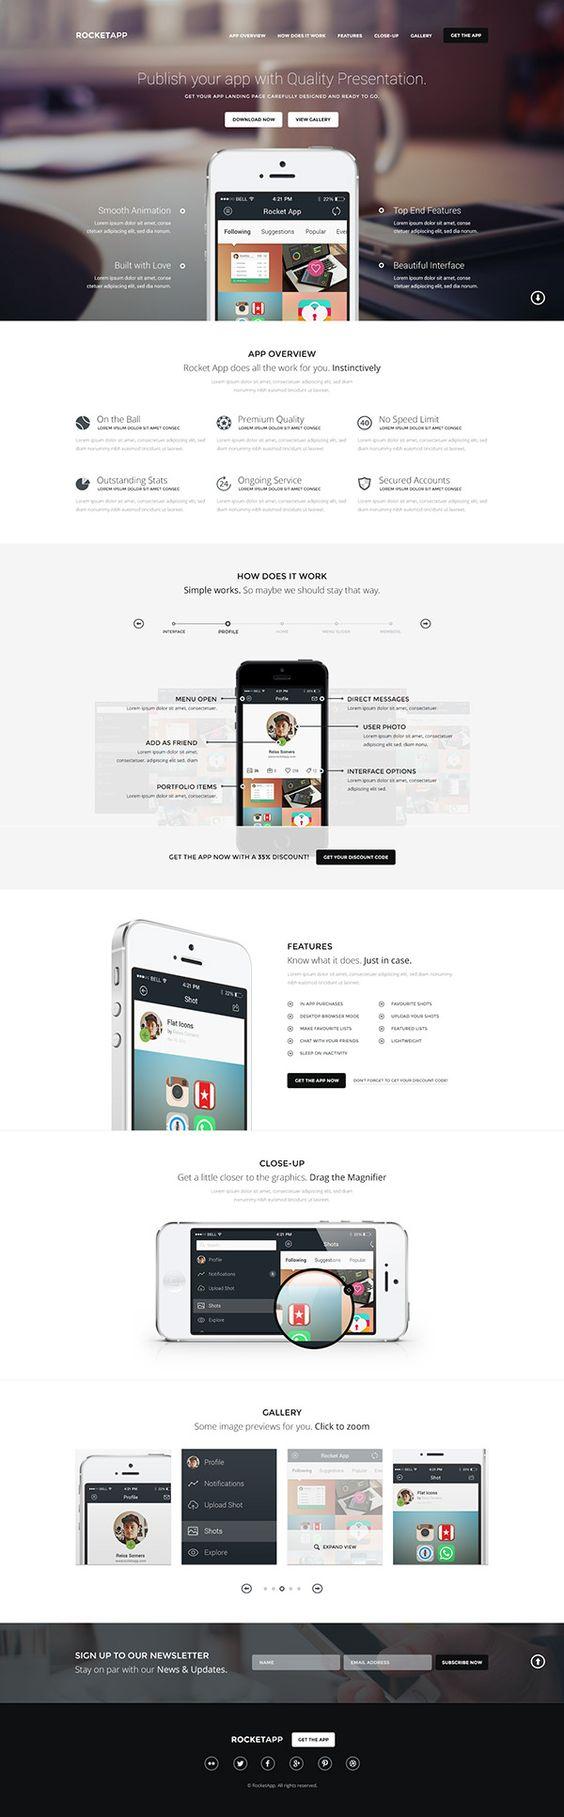 PSD Template - RocketApp Responsive App Landing Page on Behance